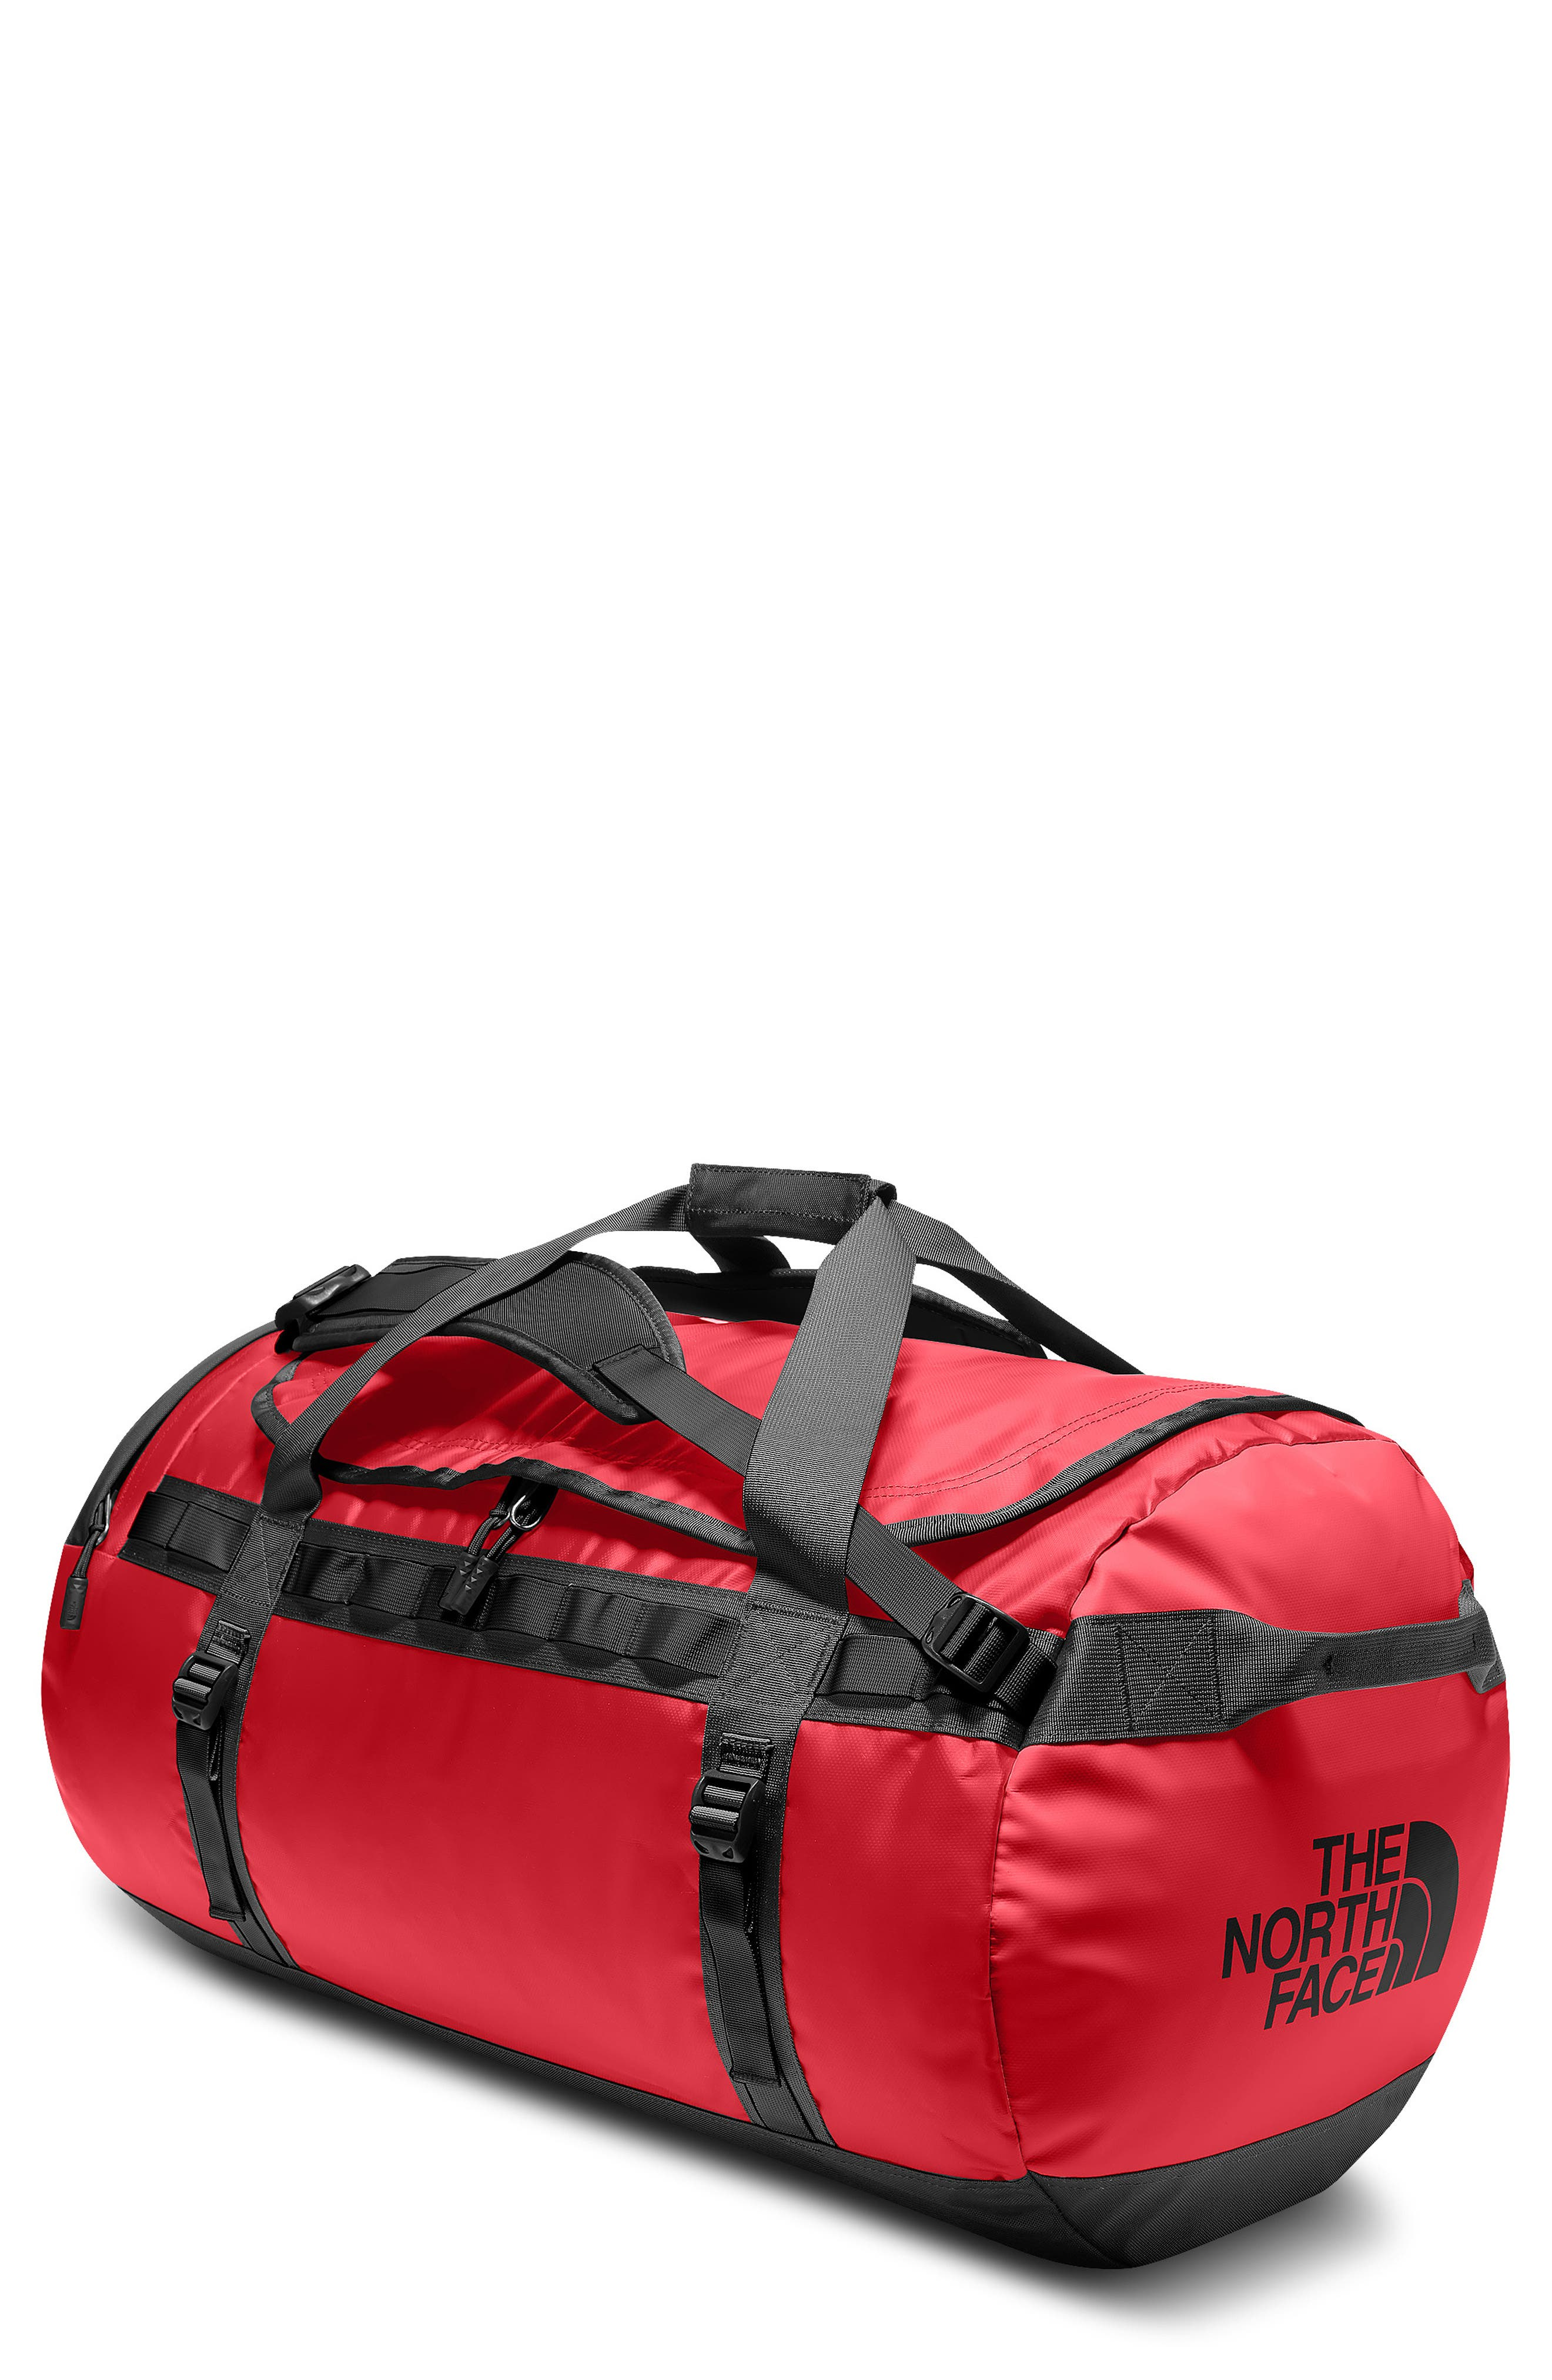 Base Camp Large Duffel Bag,                             Main thumbnail 1, color,                             Red/ Black